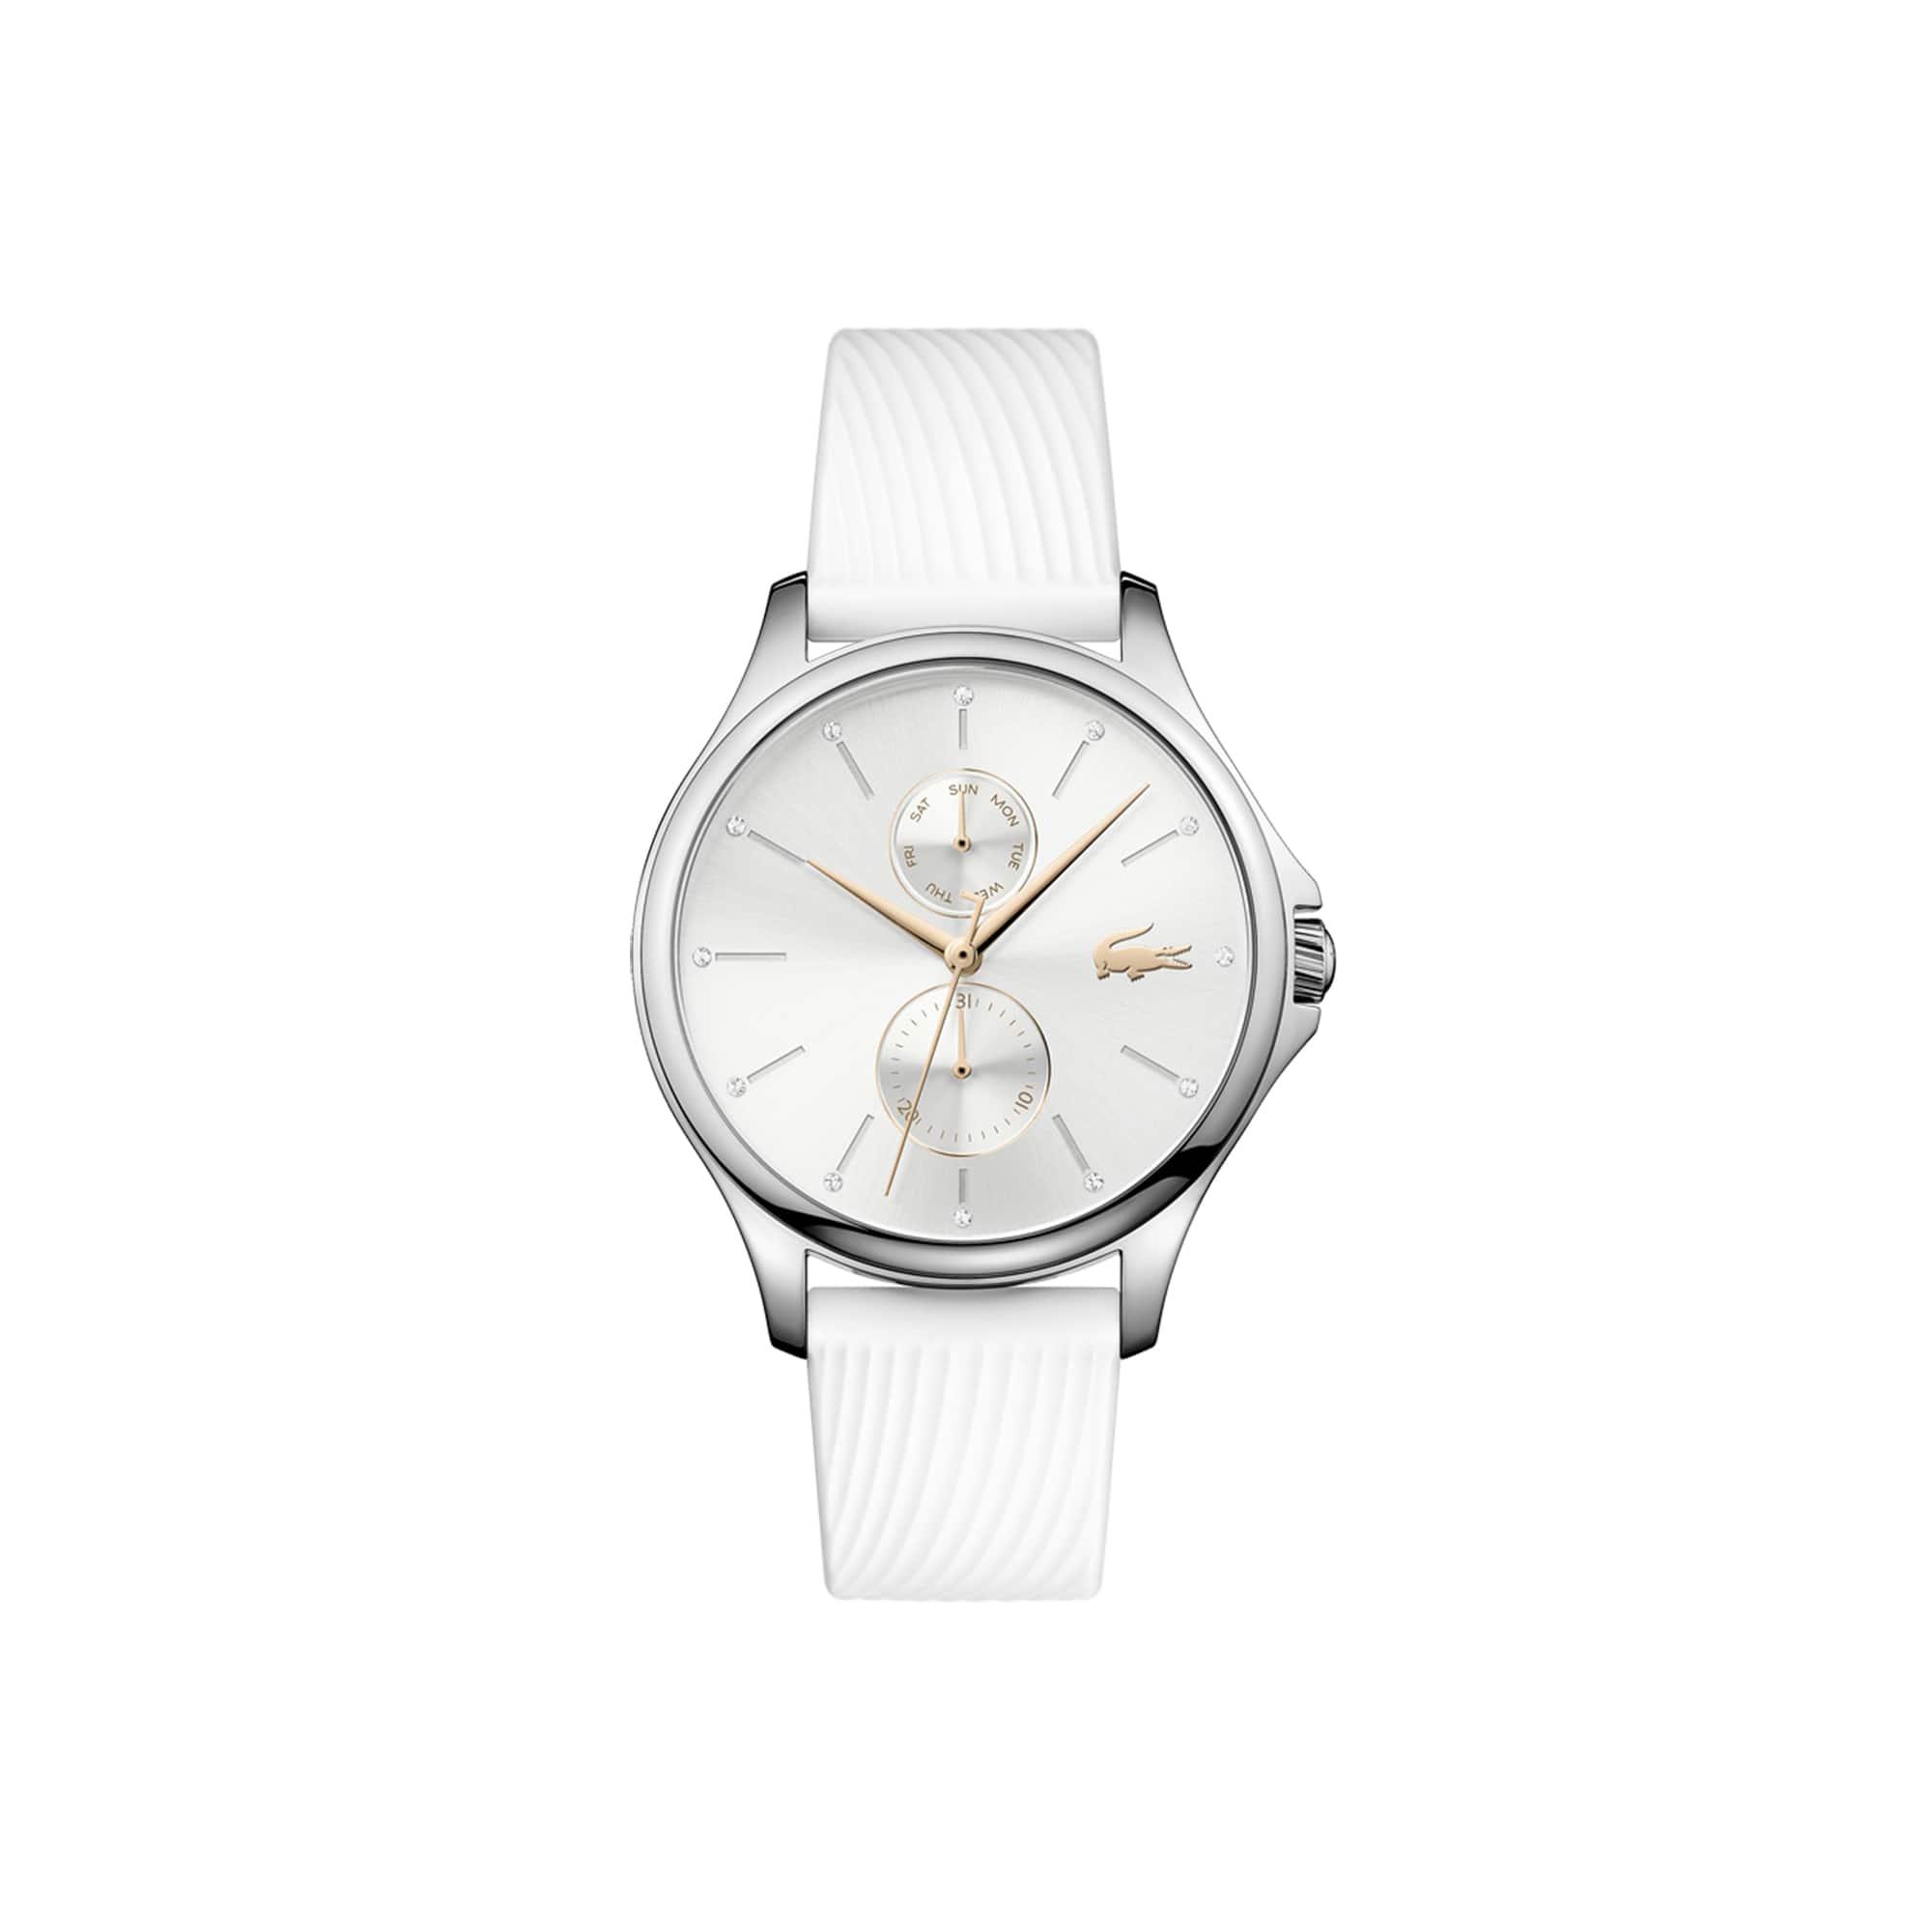 Multifunctioneel horloge Kea met witte siliconenband